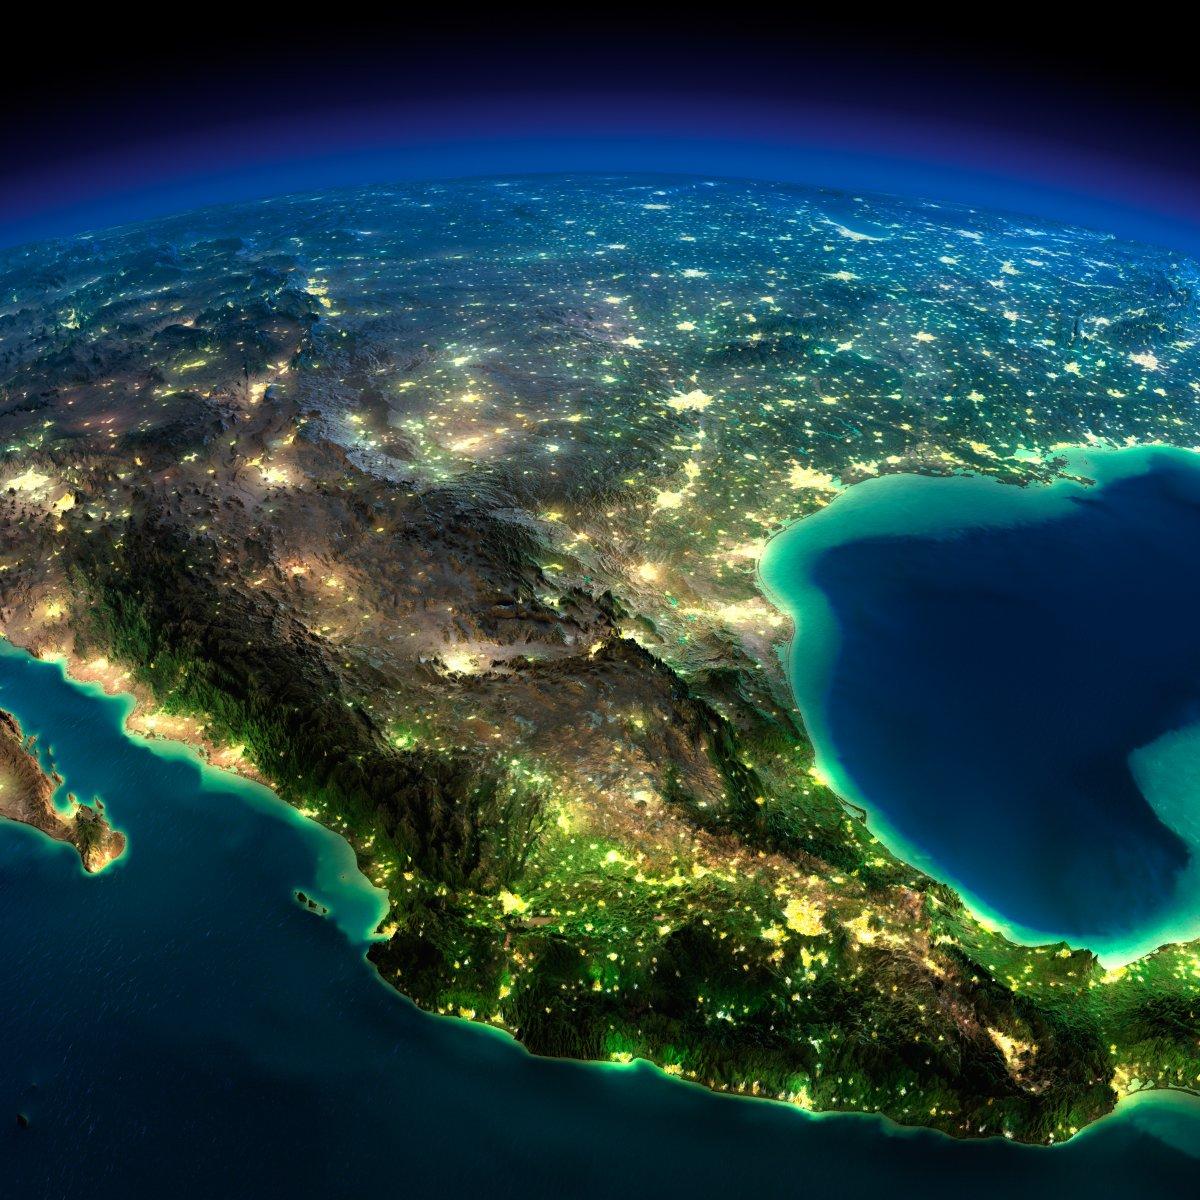 earth night photos mexico by anton balazh